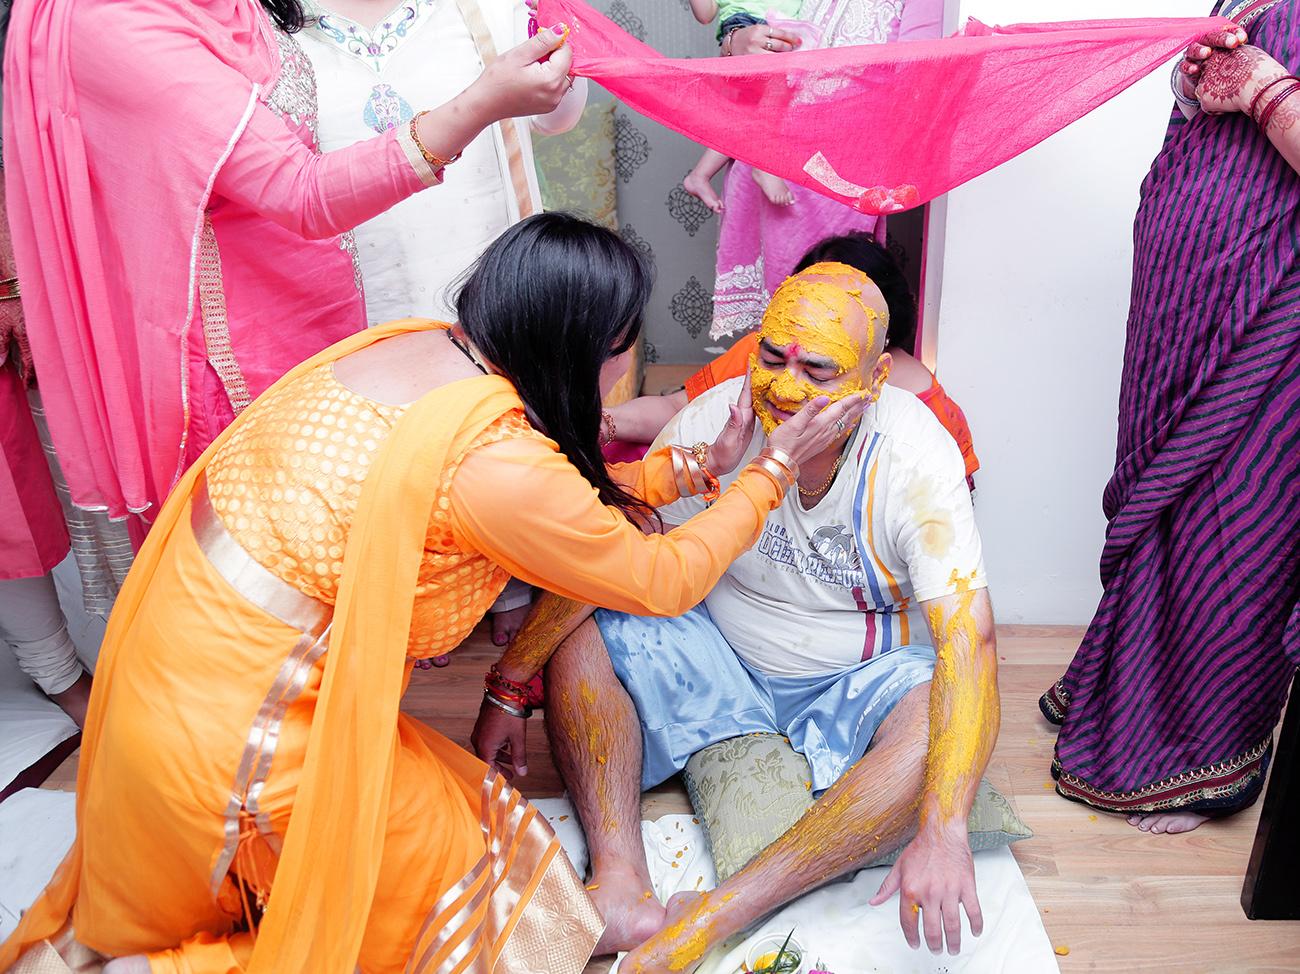 Groom Haldi Ceremony Delhi Wedding by sandeep kashyap